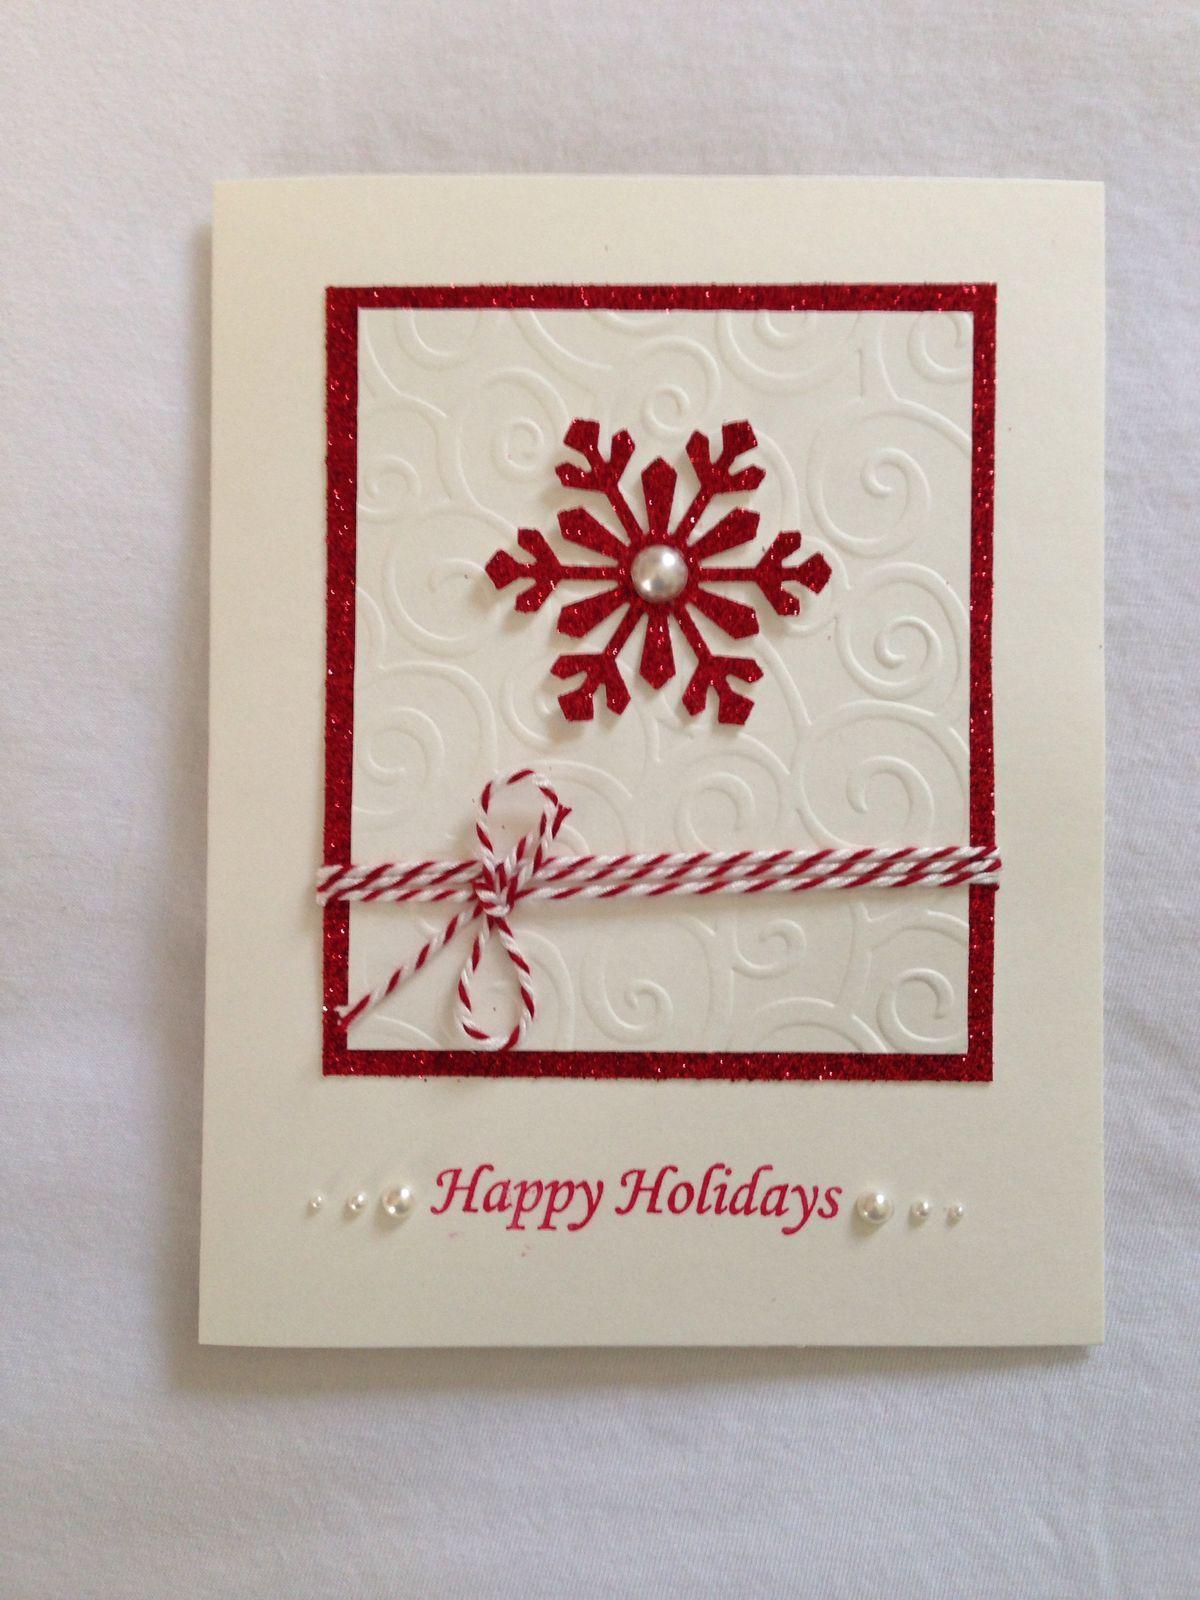 E1d0249d1fa6224d48f6b9c610f074c6g 12001600 Pixels Christmas